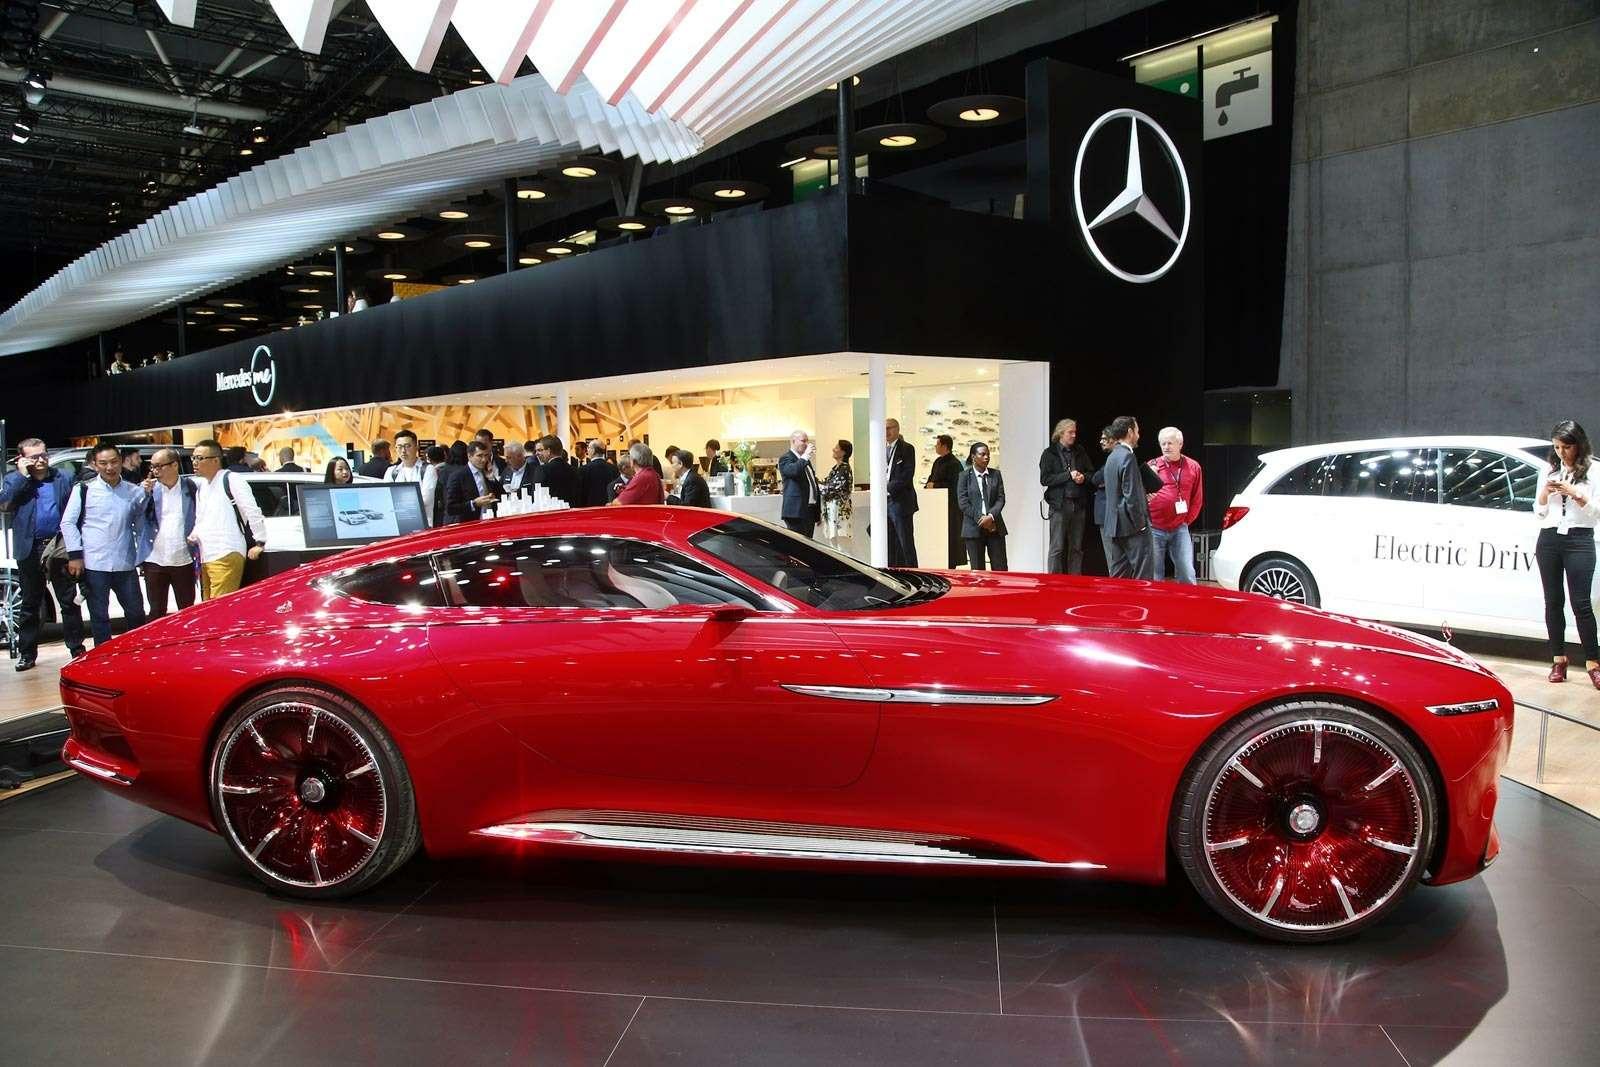 Самый красивый автомобиль Парижа: Vision Mercedes-Maybach 6завоевывает сердца— фото 643575